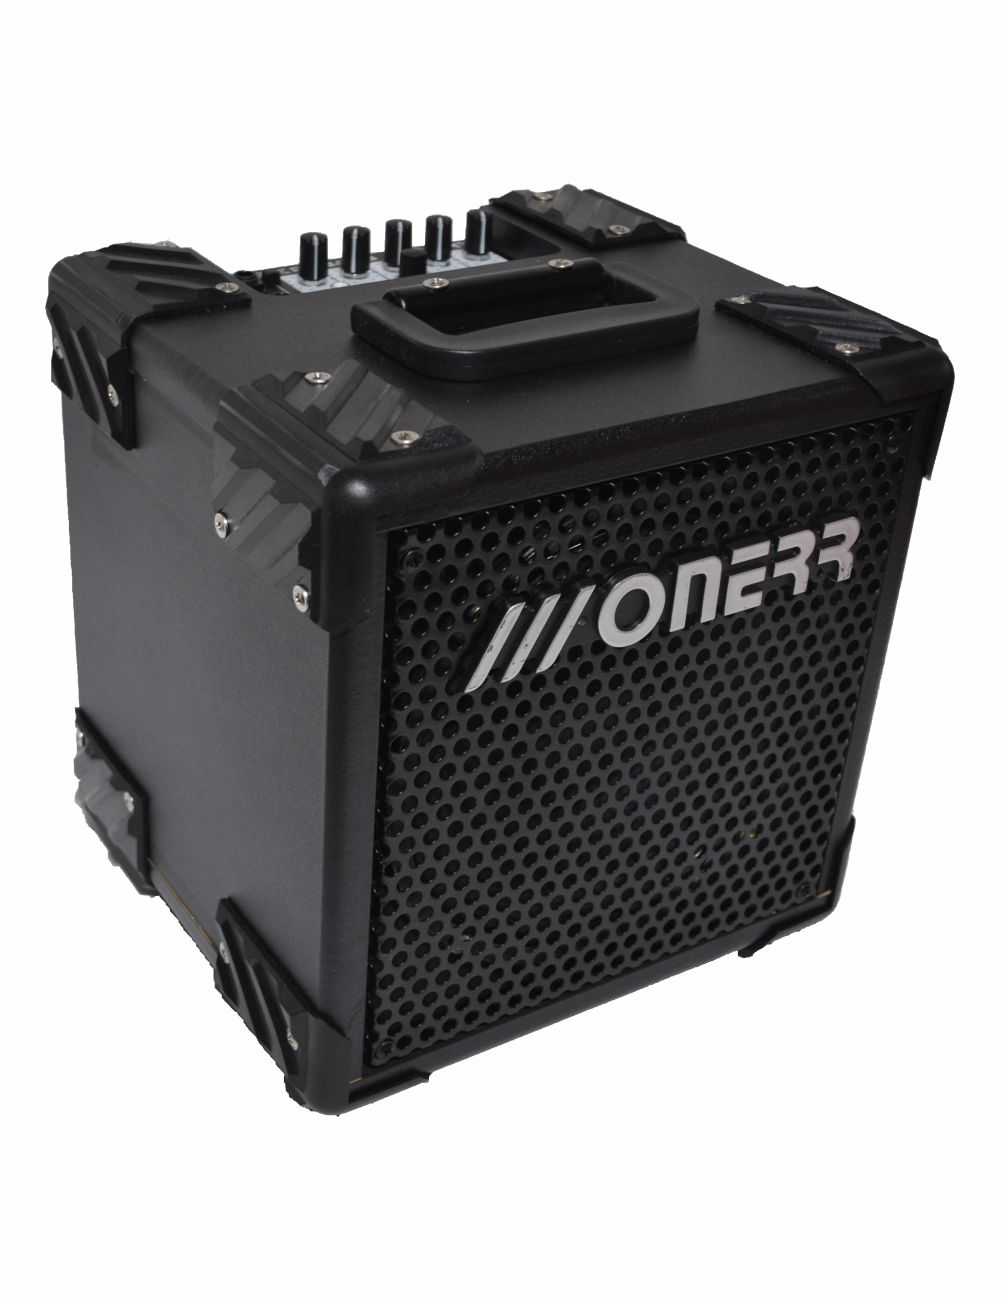 Caixa Amplificada Onerr Block 30 Bass BT-Mic